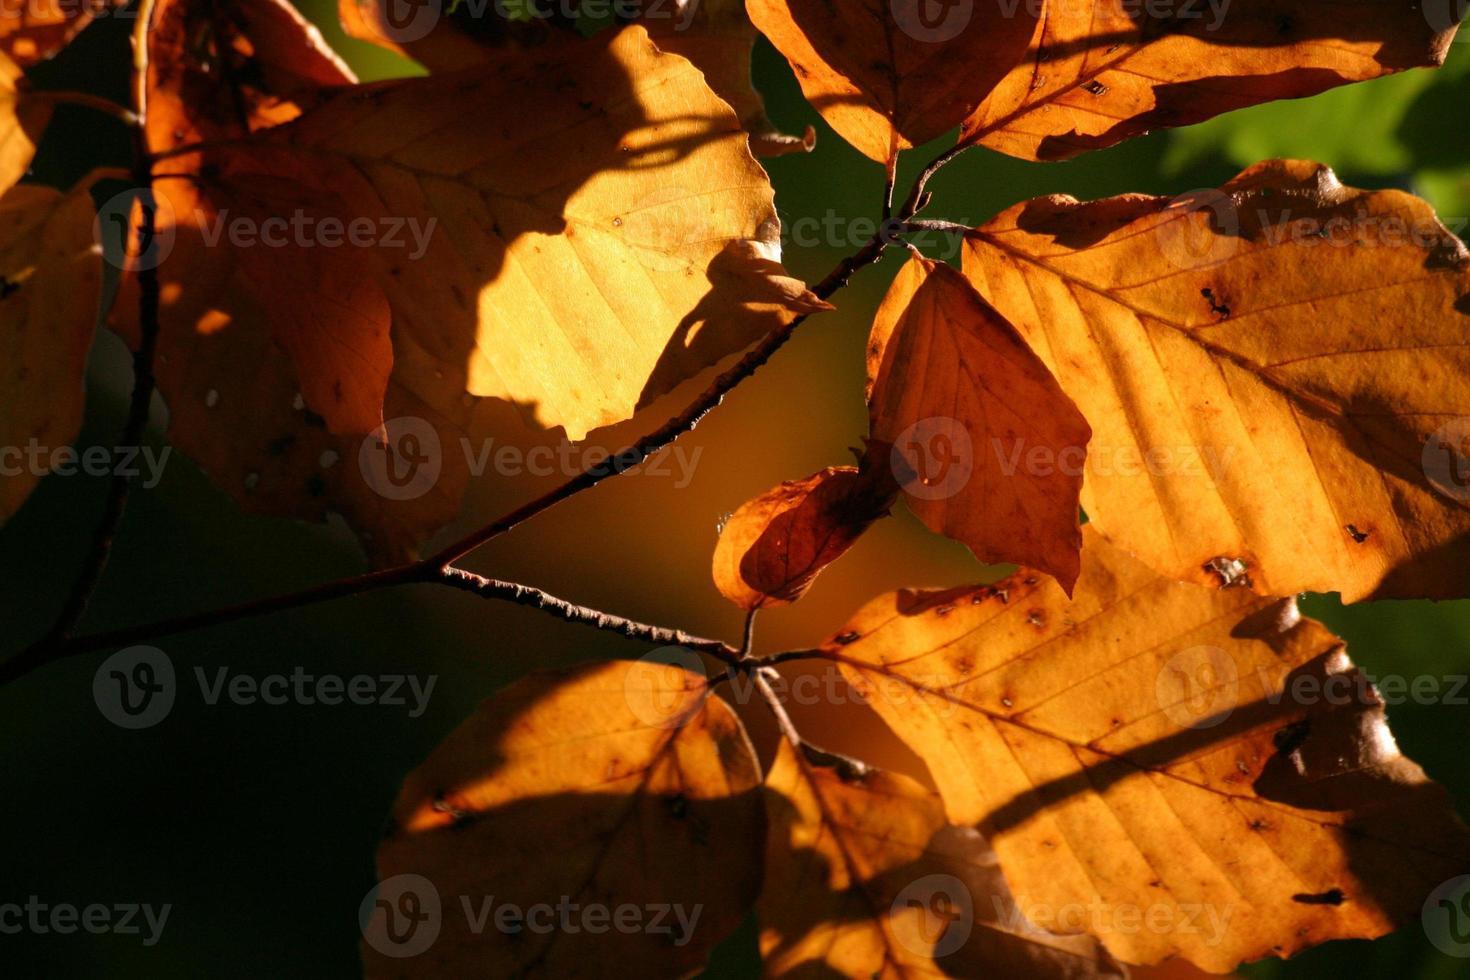 höstlöv i bakgrundsbelysning foto